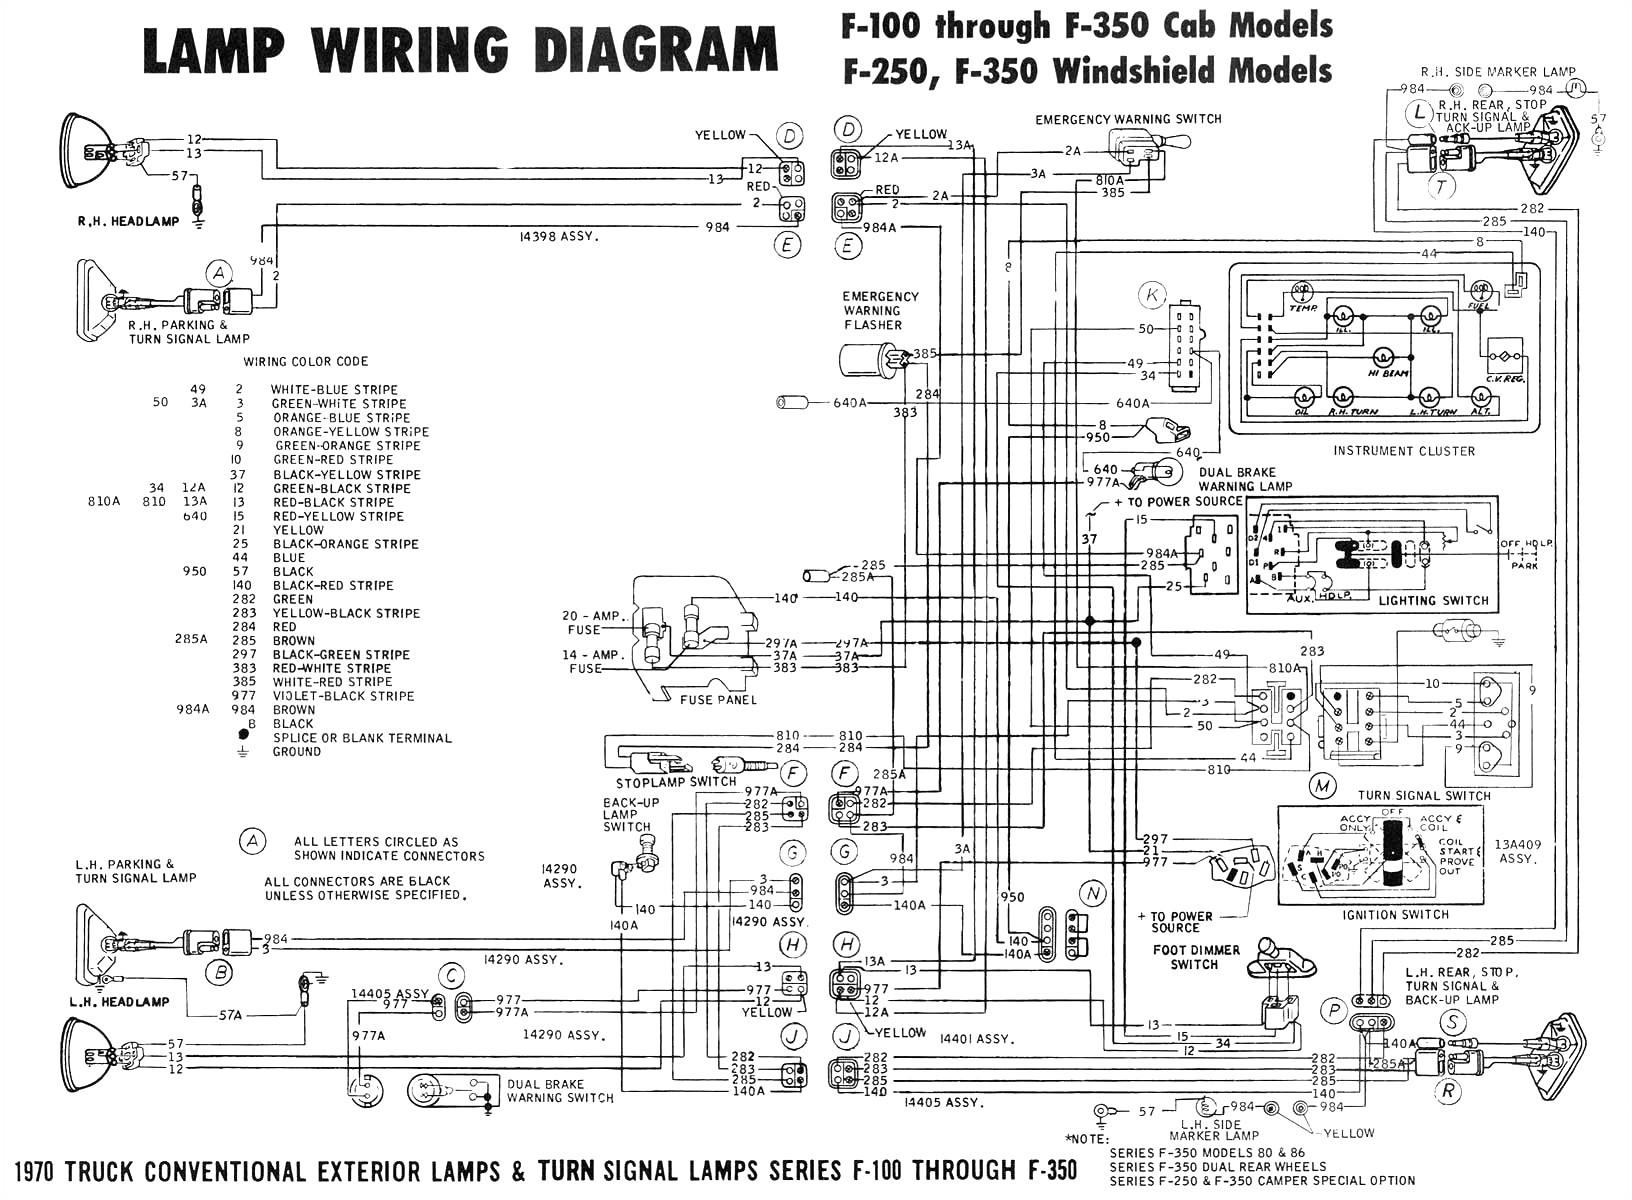 wiring diagram in addition acura integra front suspension diagram mix 1995 acura legend belt diagram wiring